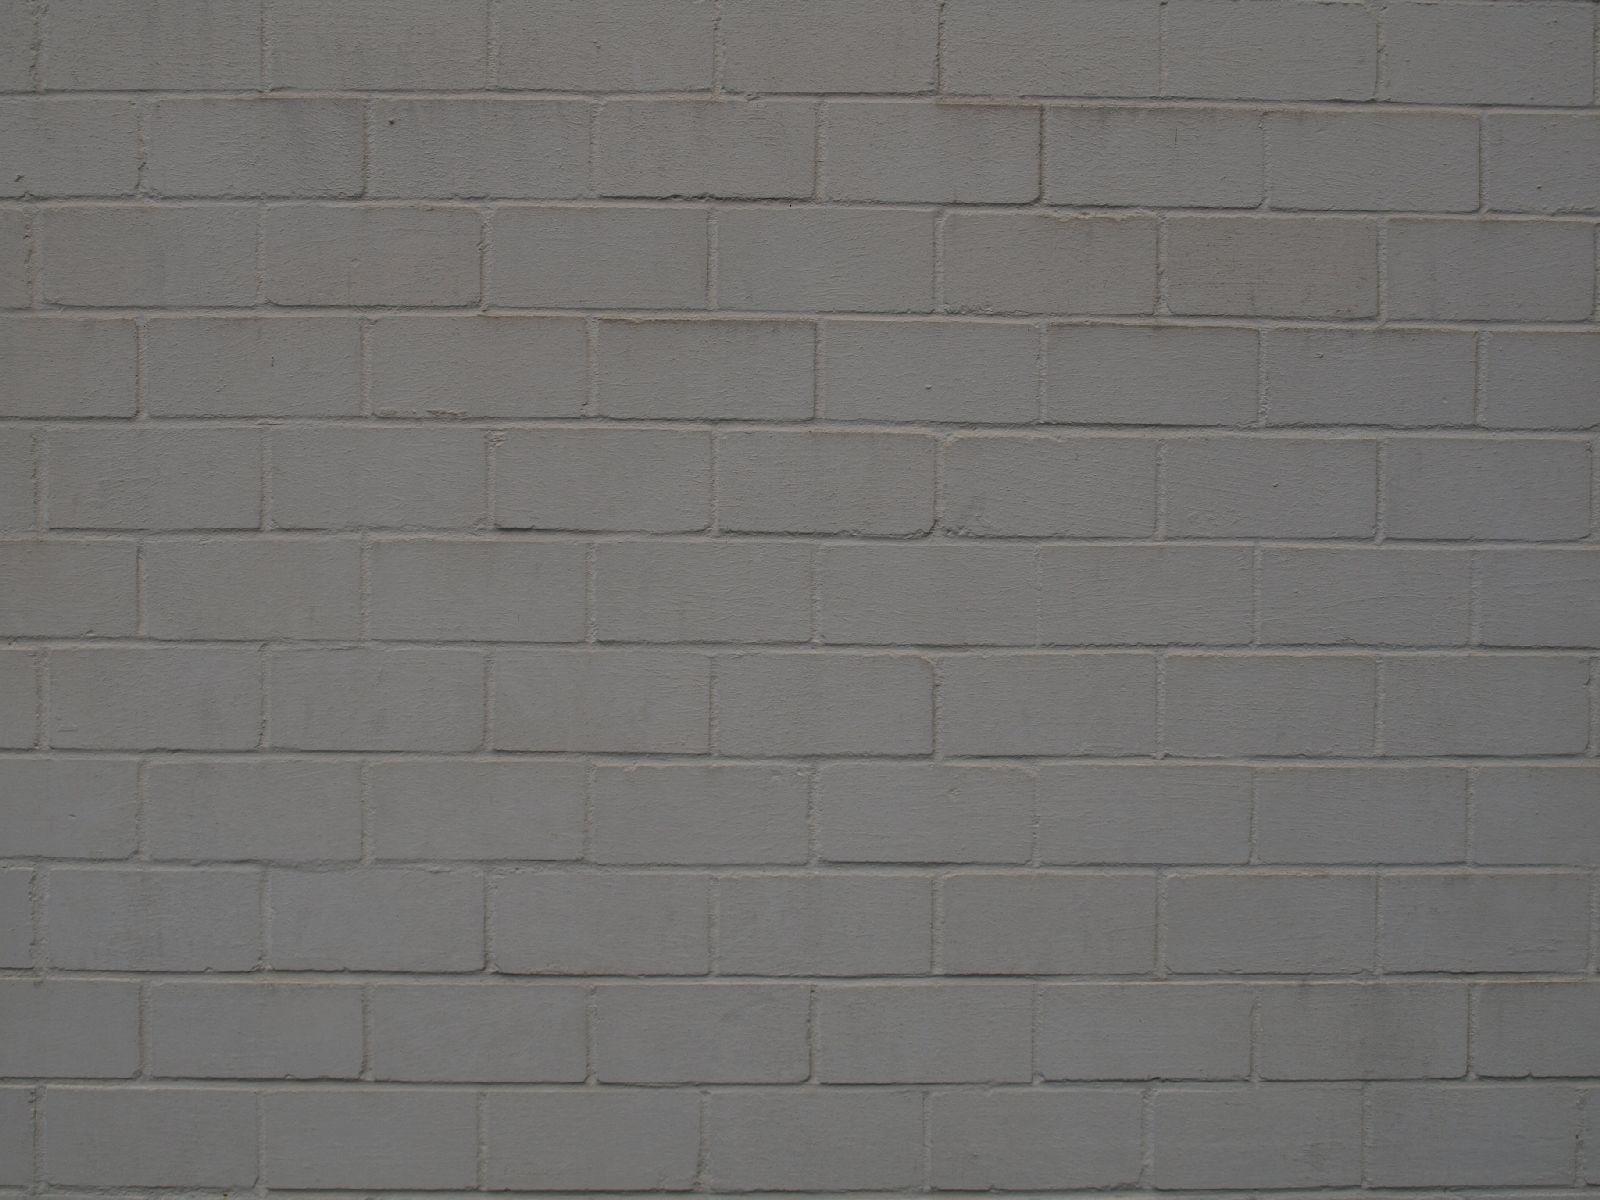 Wand-Mauerwerk-Backstein_Textur_A_PC197857